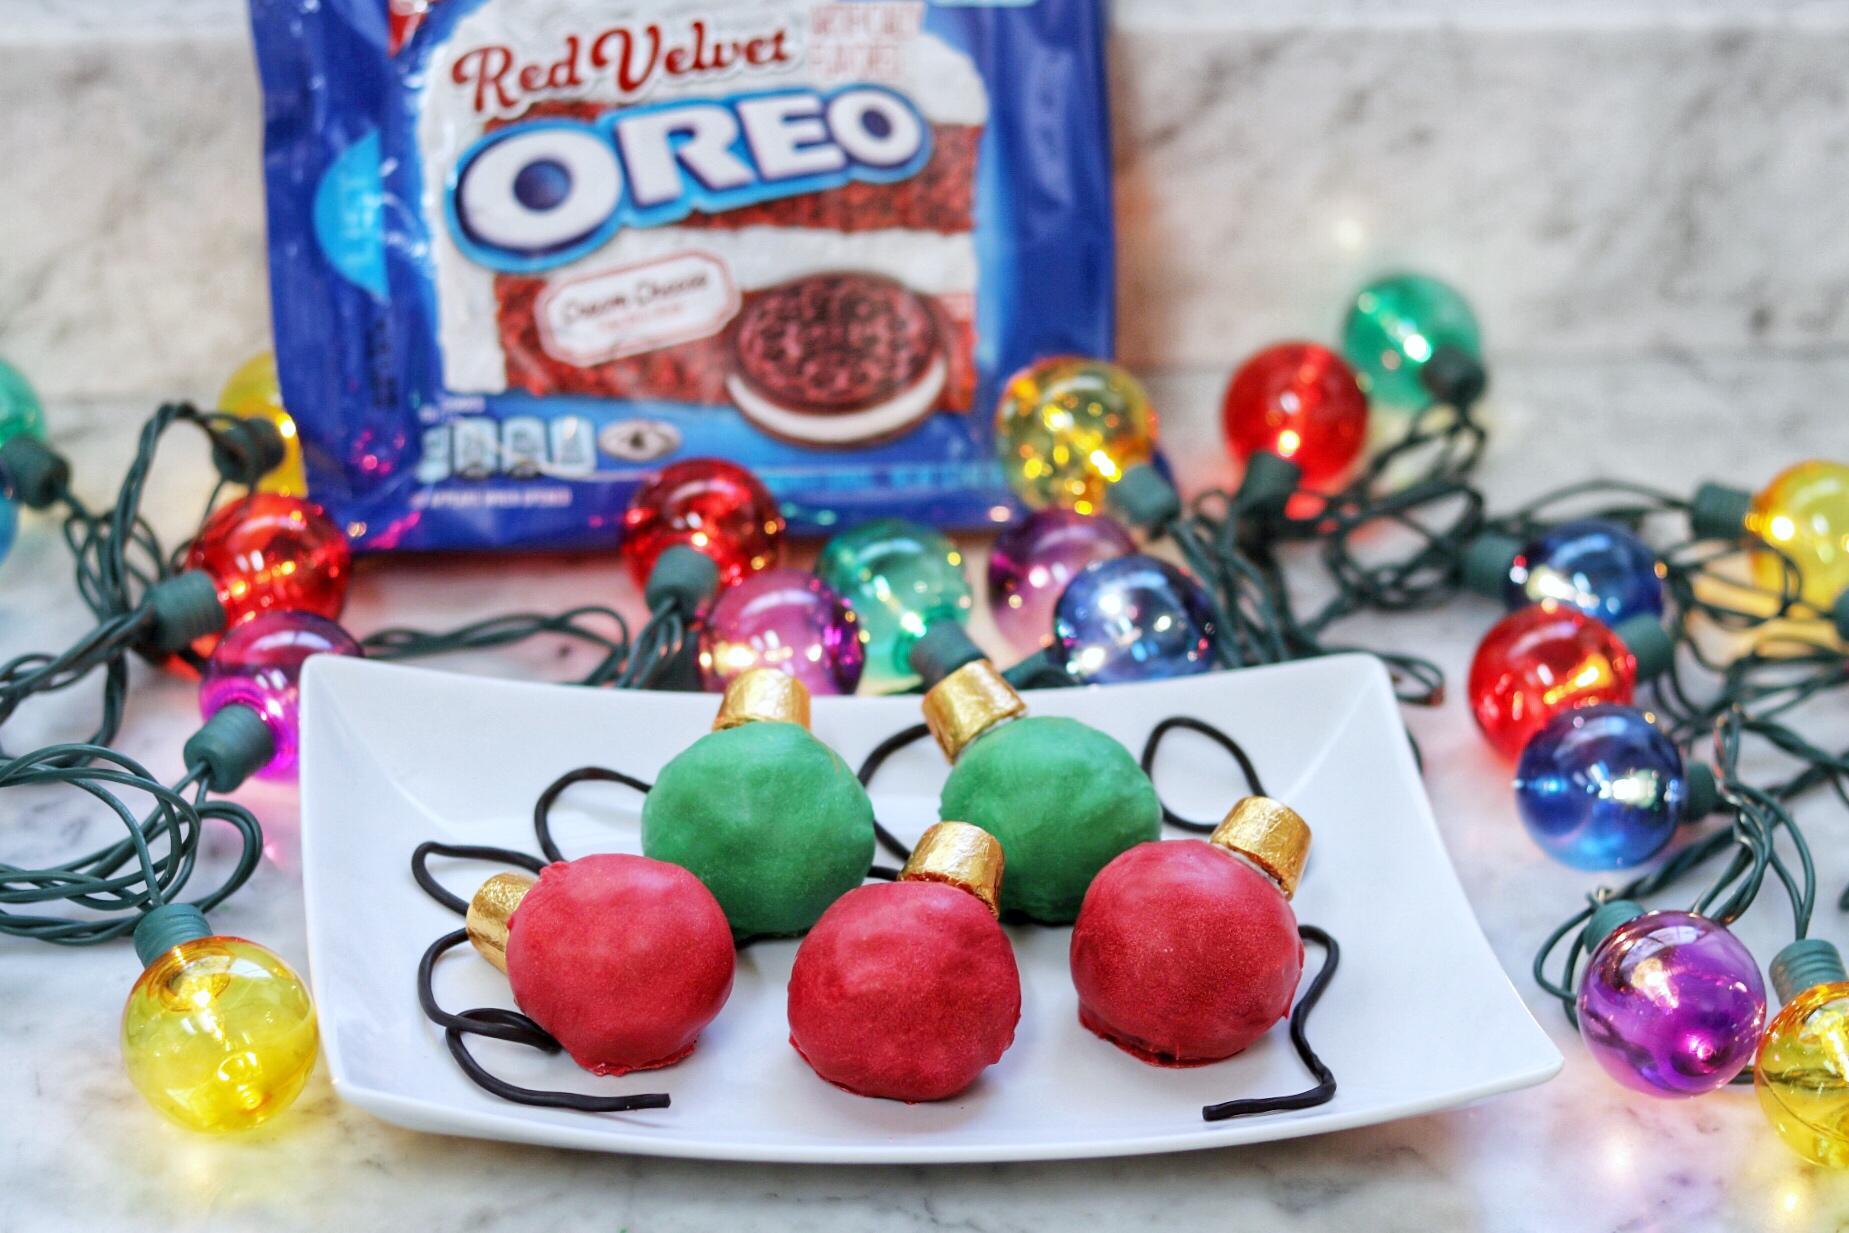 OREO cookie Christmas recipes: OREO Cookie Balls Christmas Lights